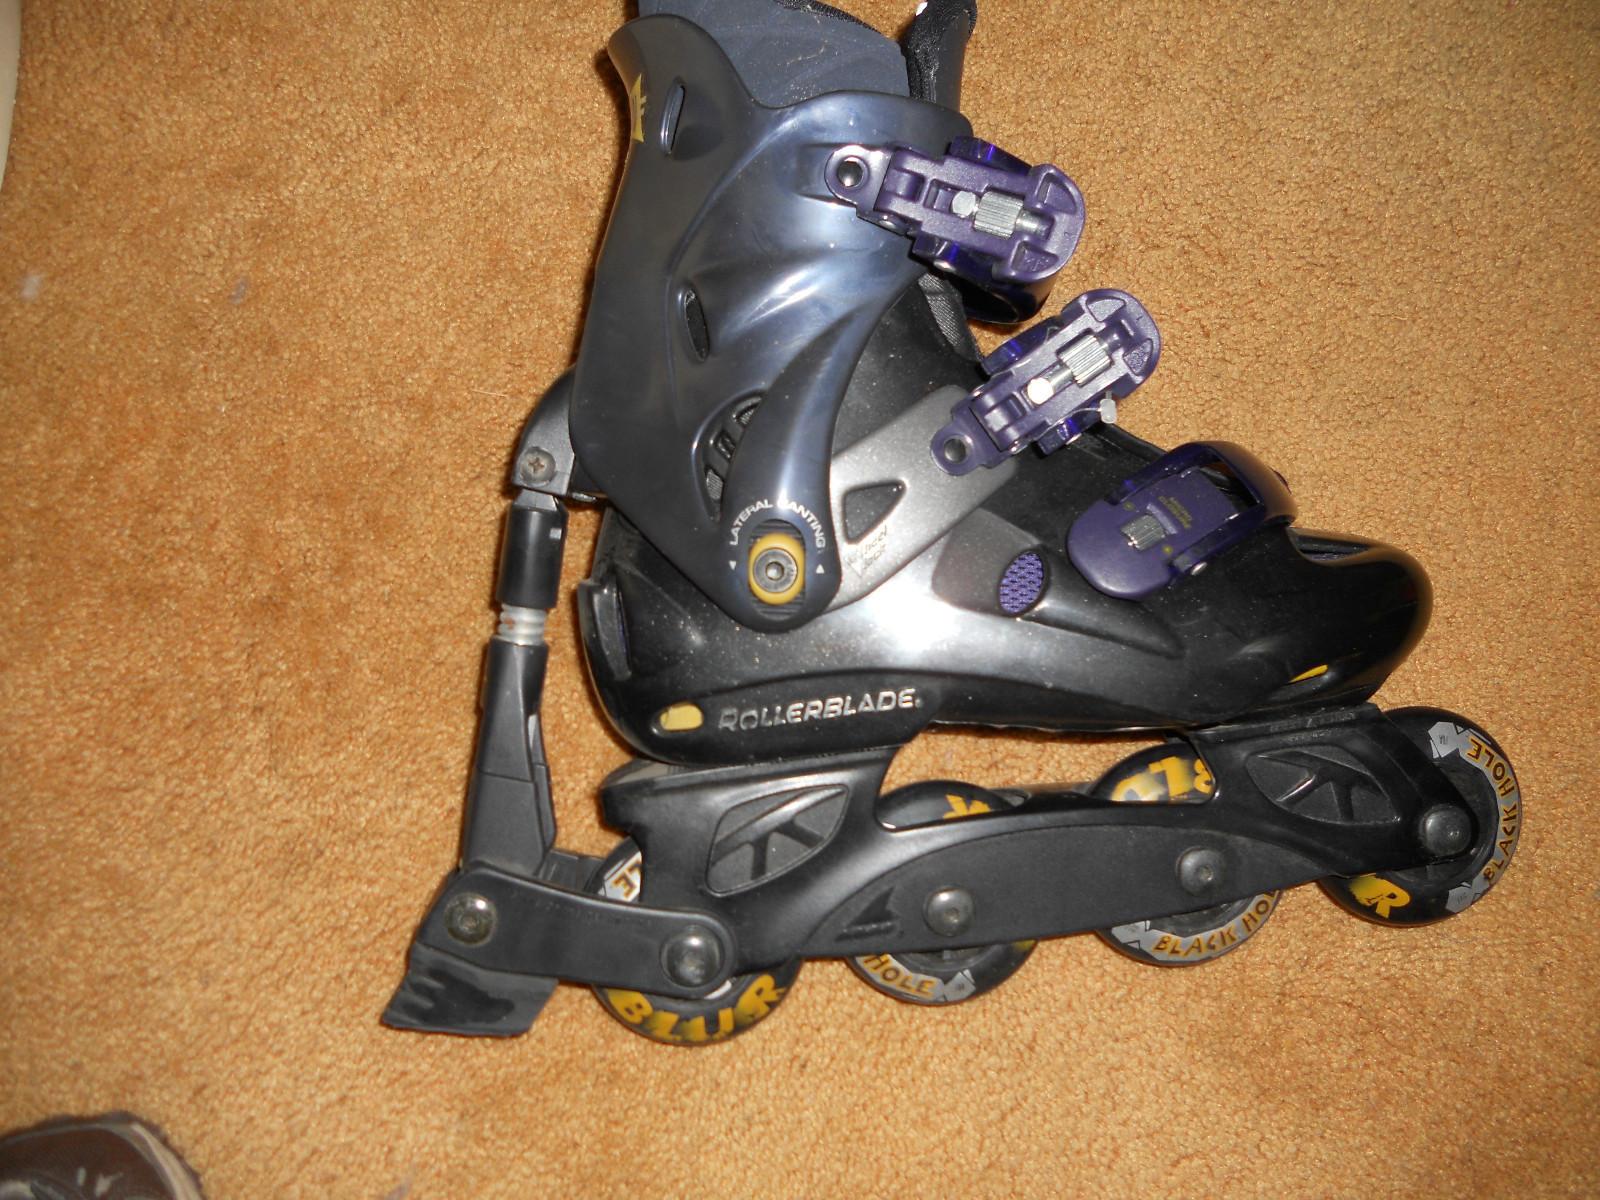 rollerblade_fusion_mx_t26_4